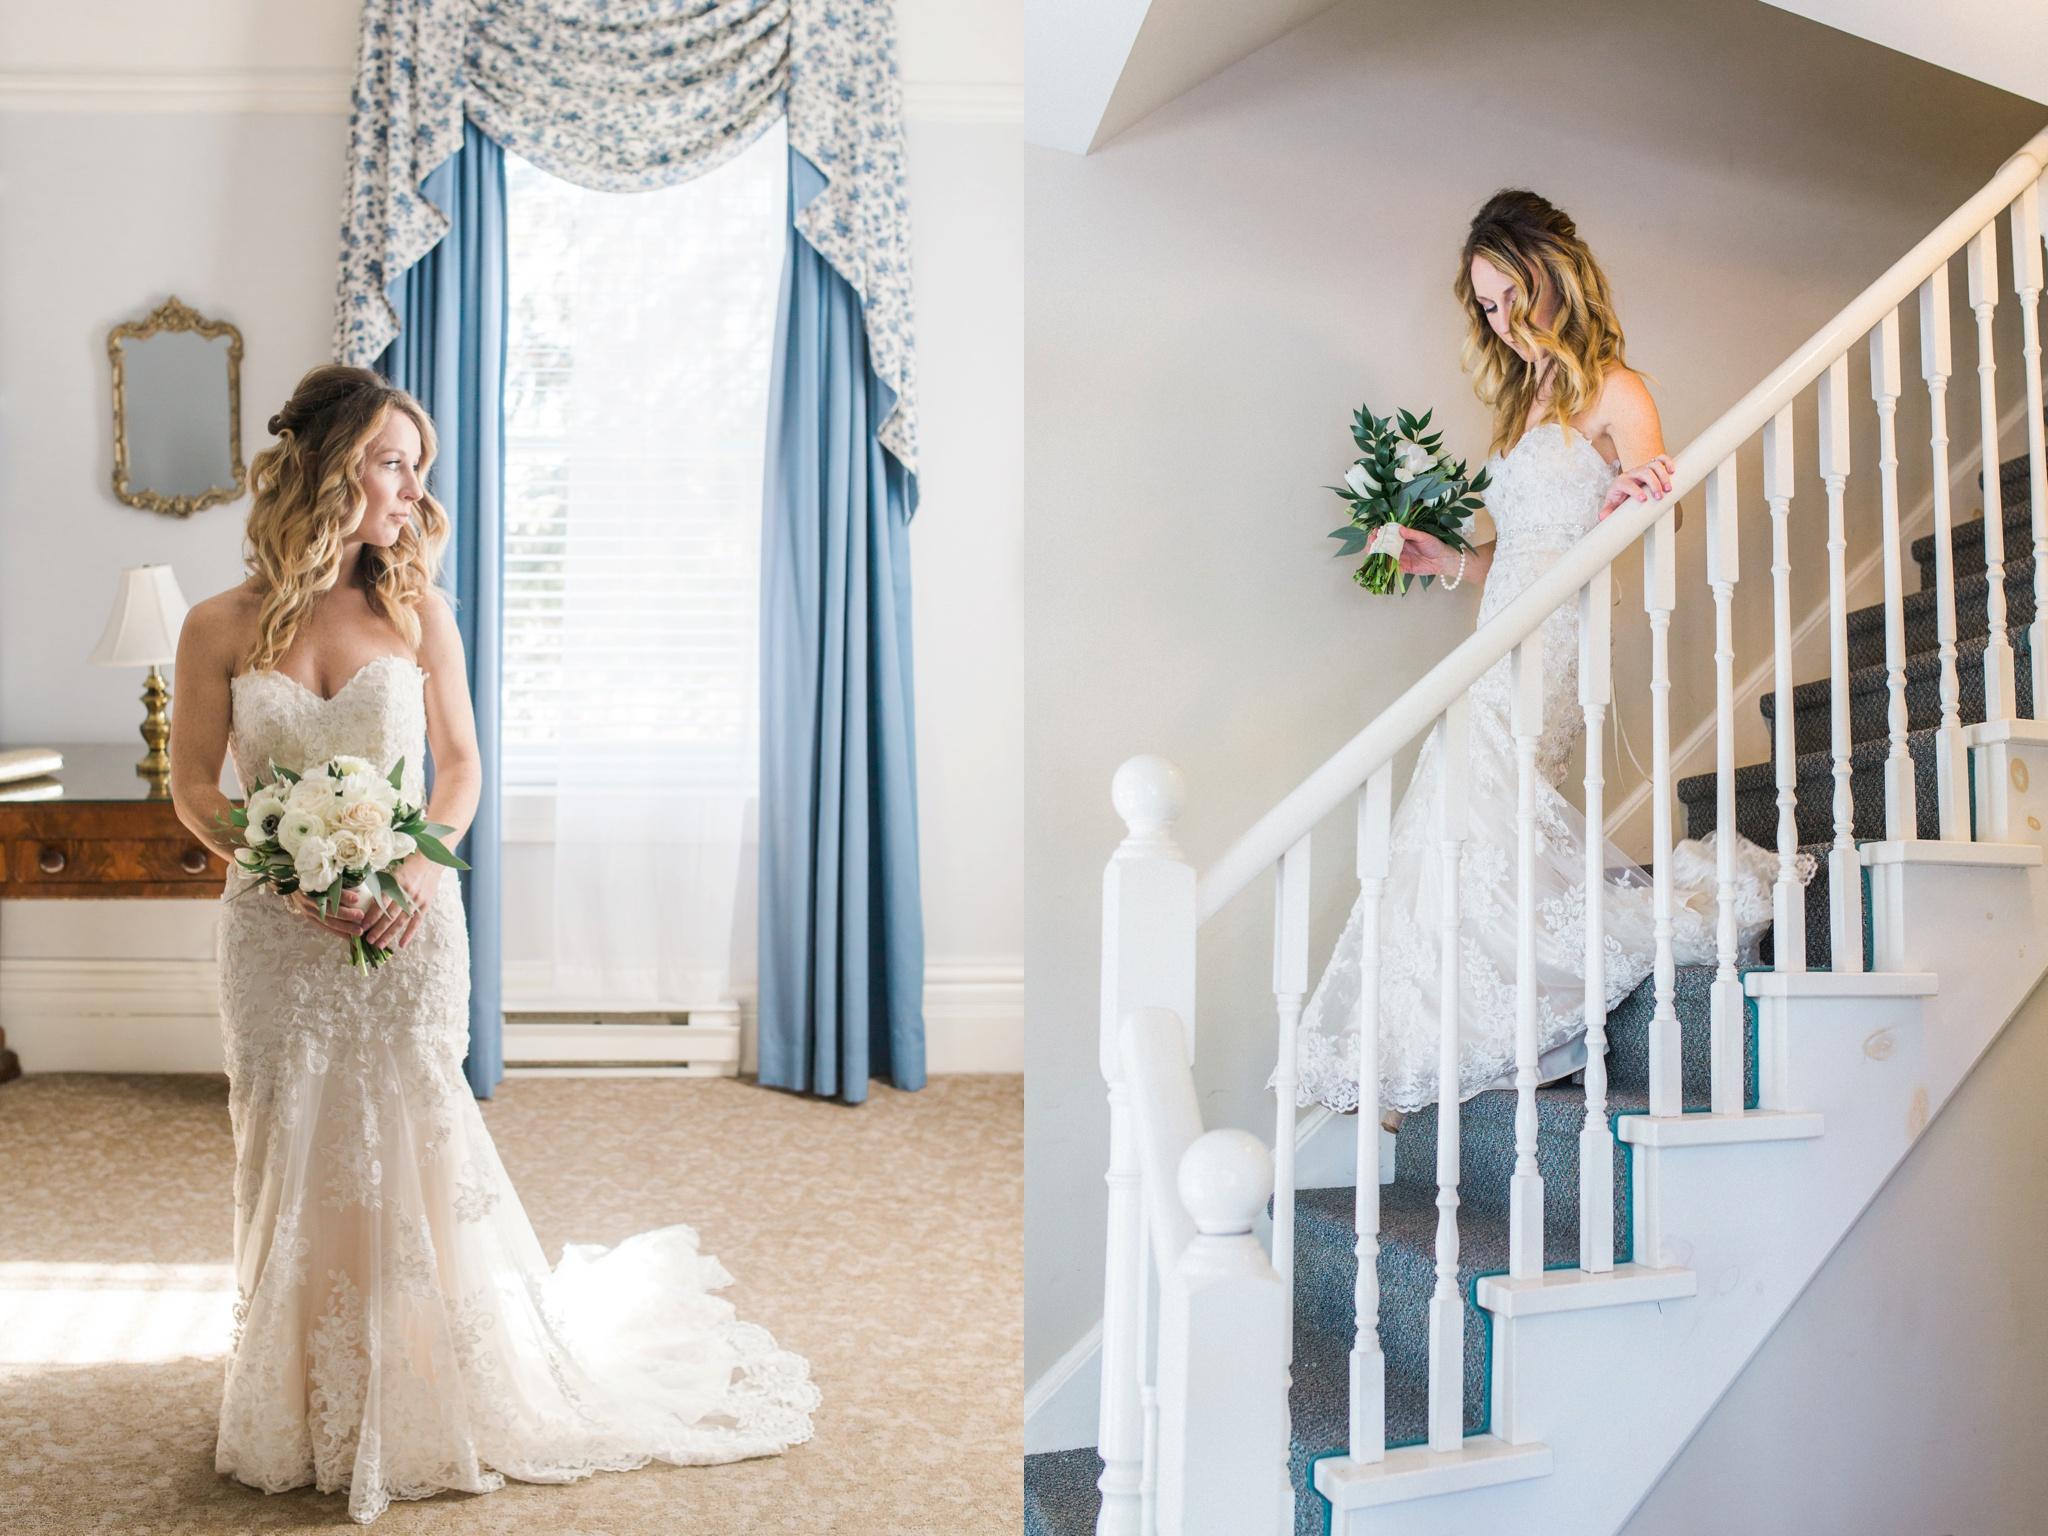 Millcroft Inn Wedding, Caledon Wedding Photographer